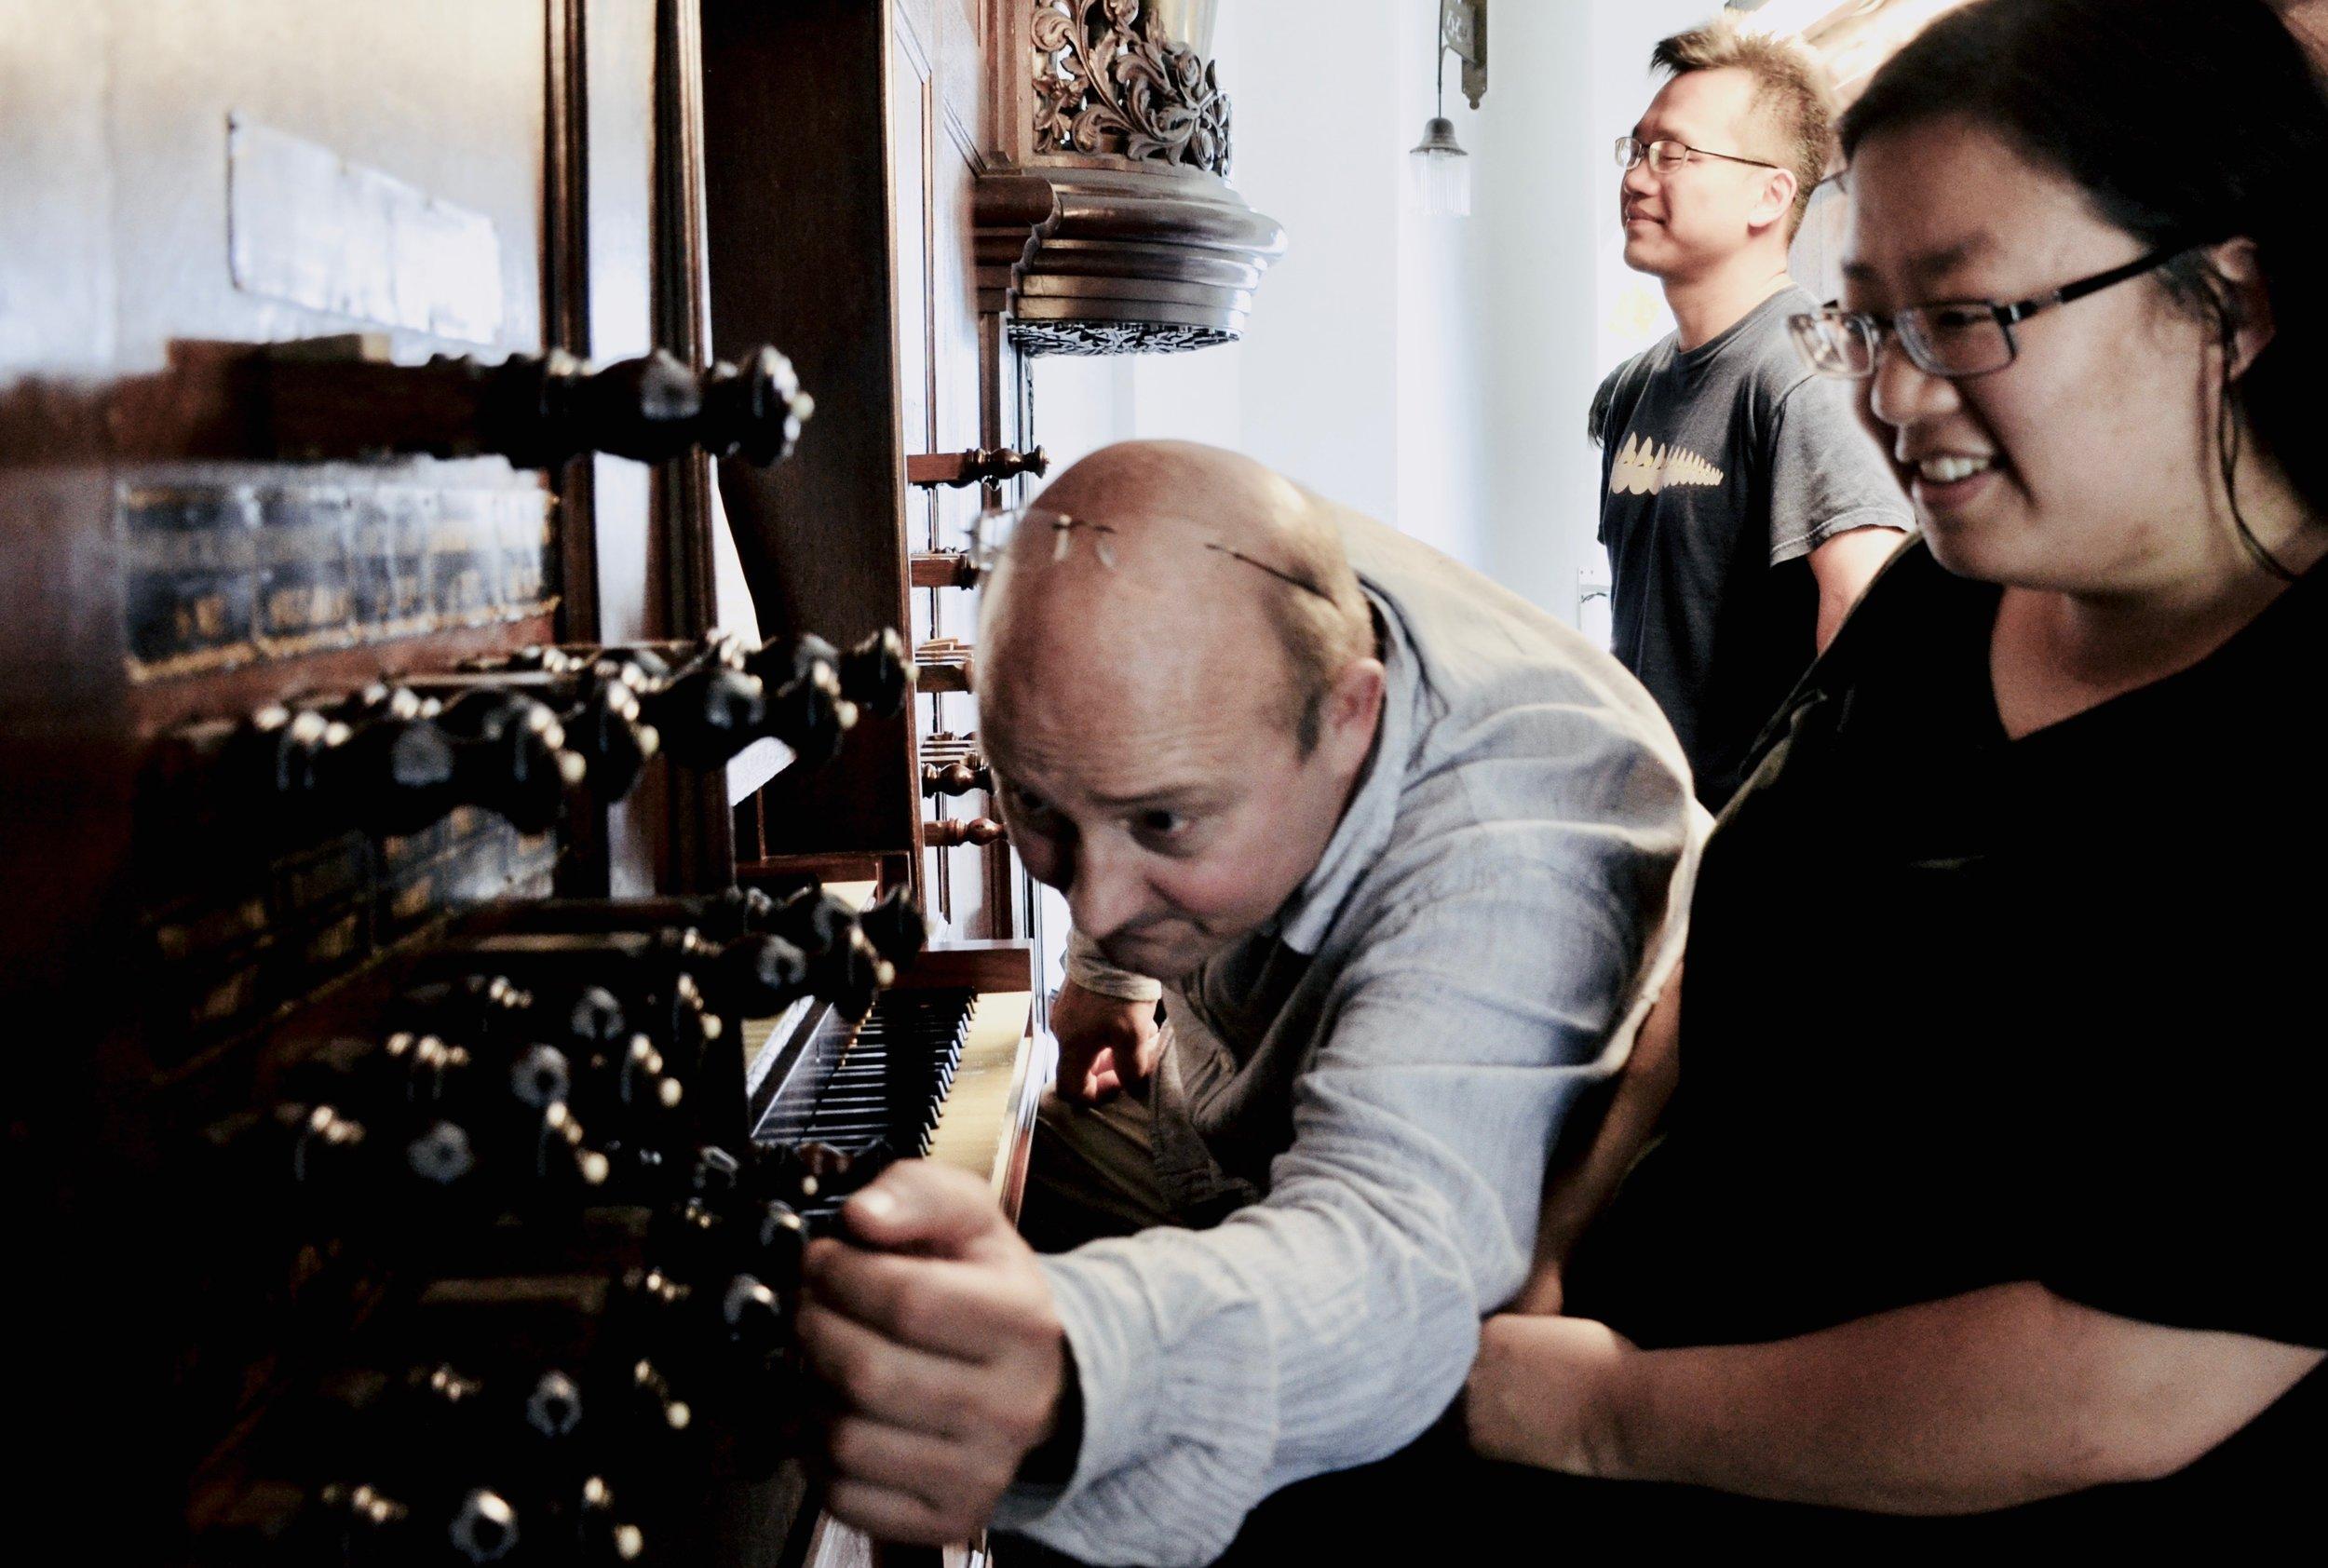 Erwin Wiersinga coaches Jennifer Hsiao on the 1823 Lohman organ in Farmsum, Holland.